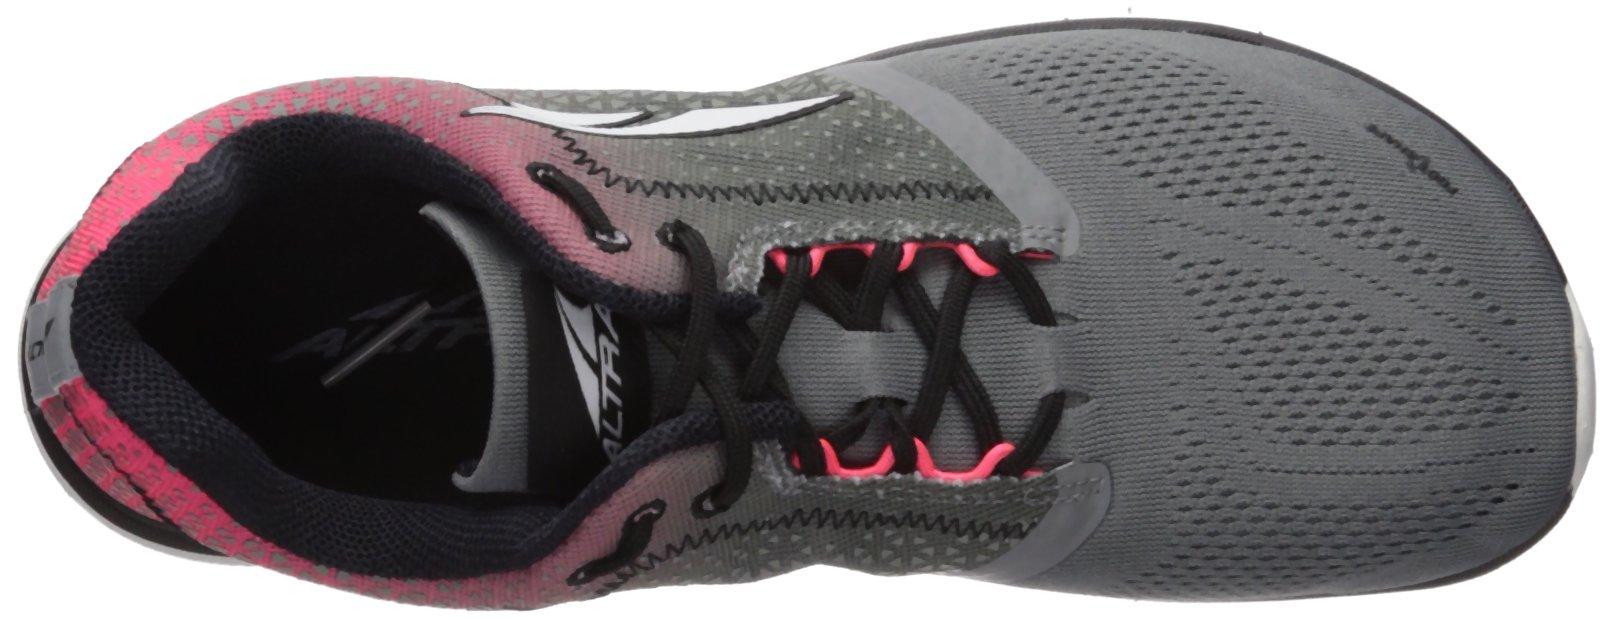 Altra Men's Solstice Sneaker Pink/Gray 7 Regular US by Altra (Image #7)